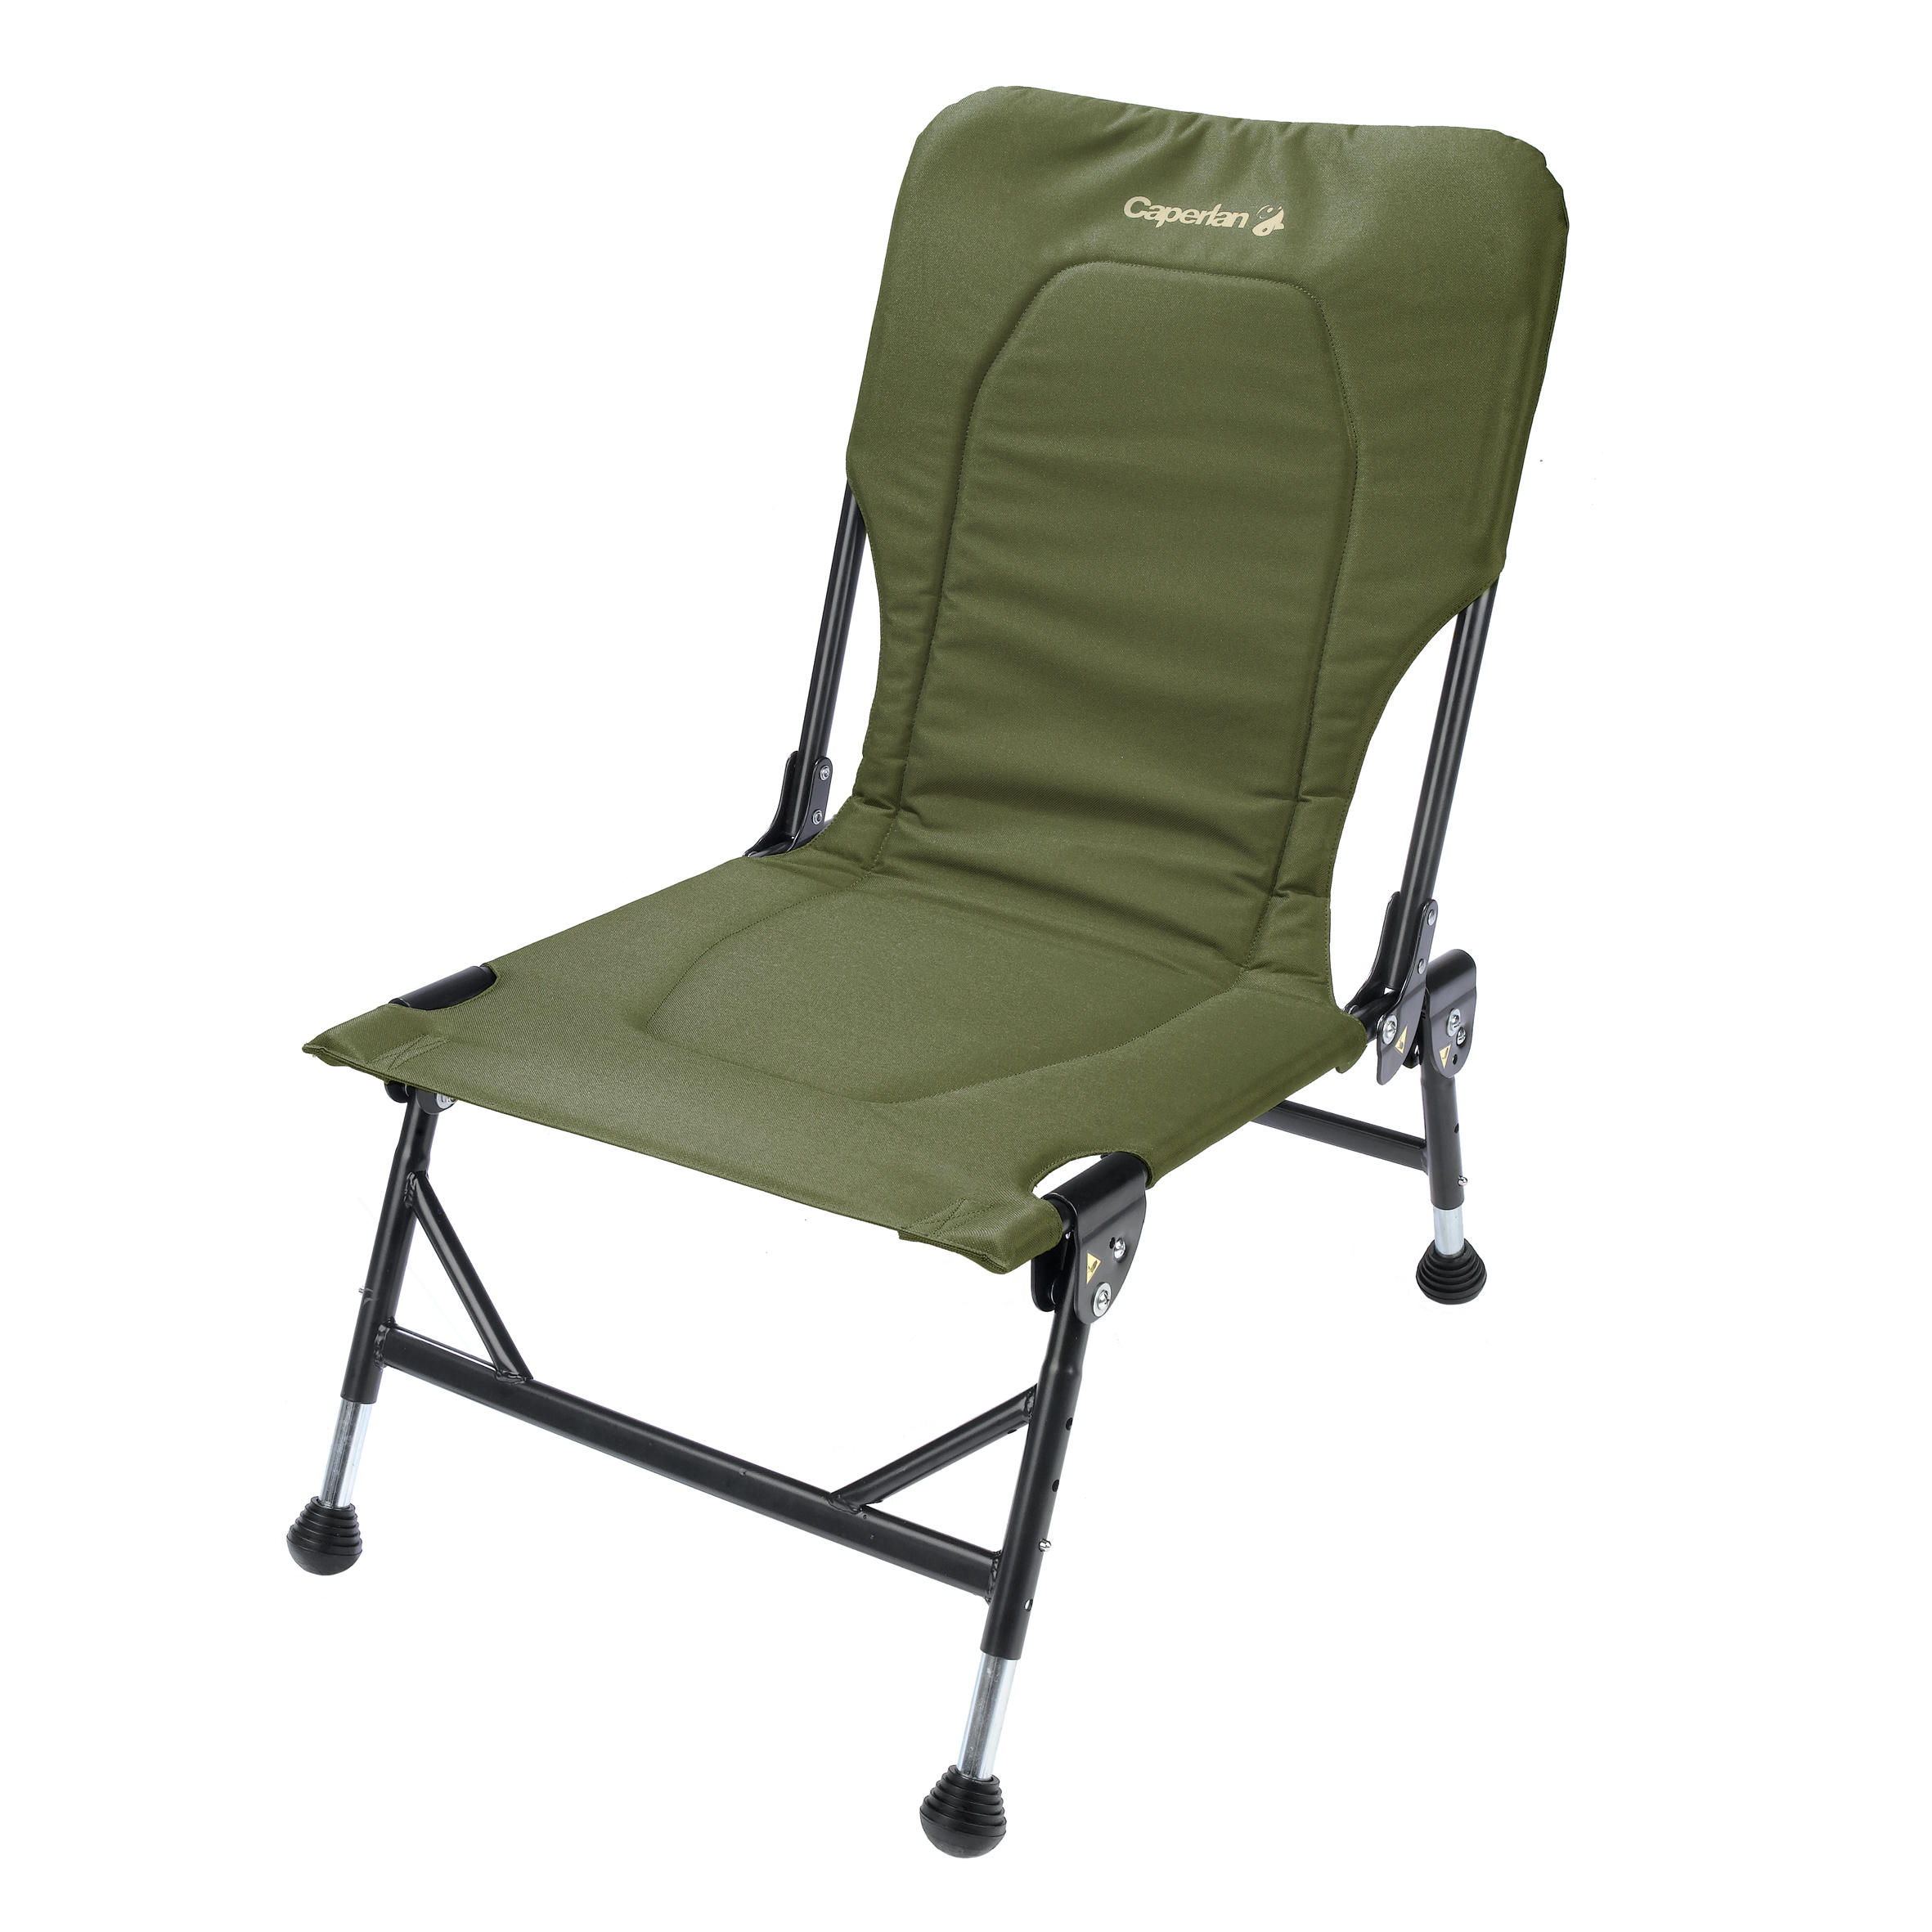 Carp fishing levelchair